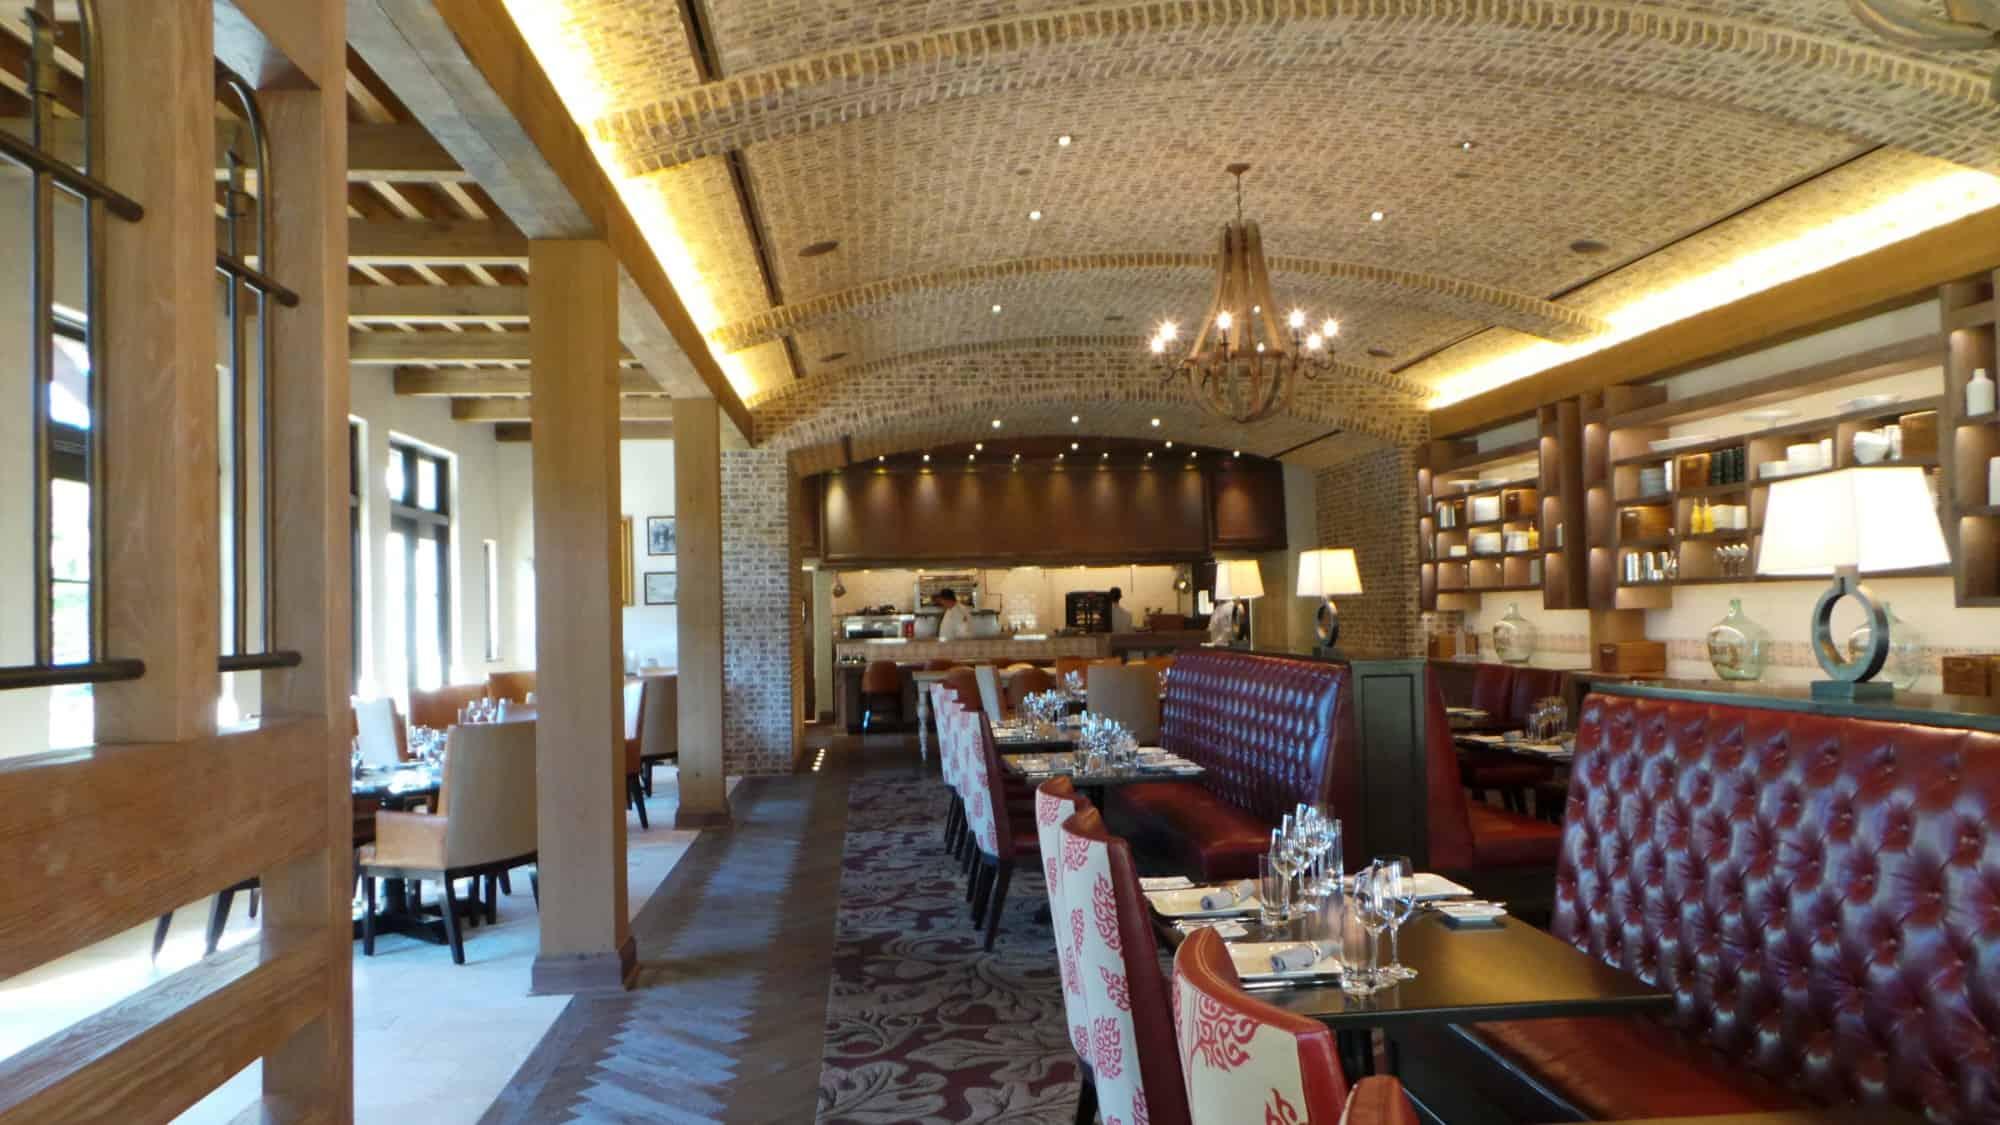 Markham's restaurant